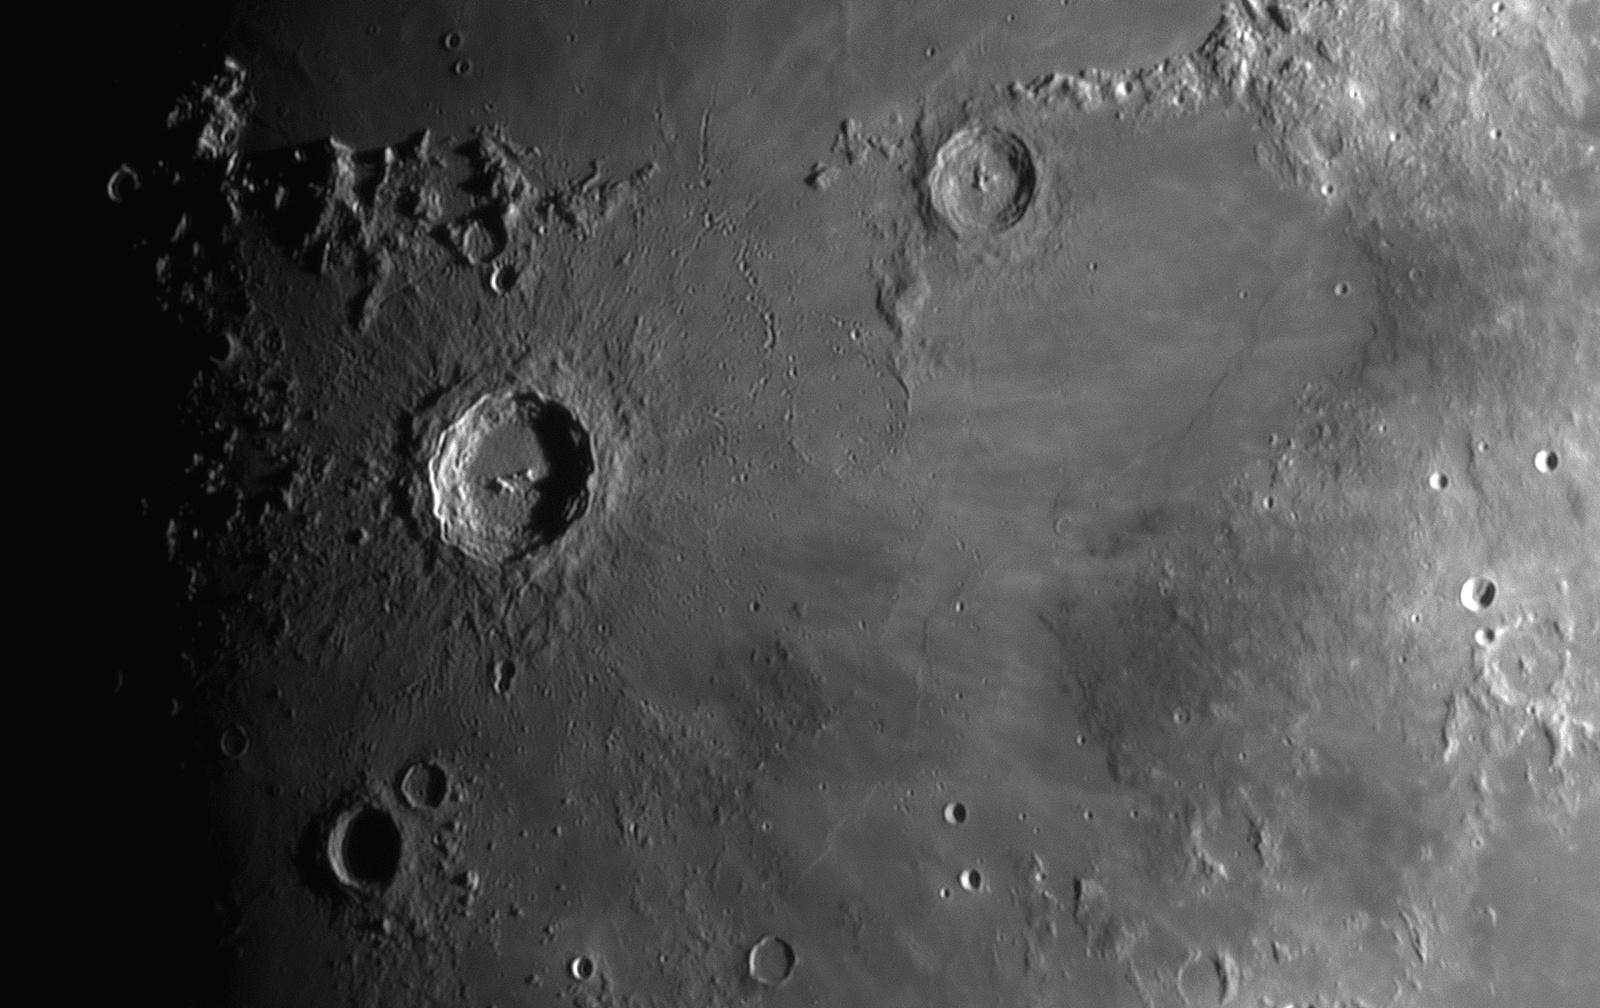 Copernicus, Reinhold, Eratosthenes 29.07.2020r_22.03_MAK150F1800_ASI290MM_IR.pas685nm_105%....jpg